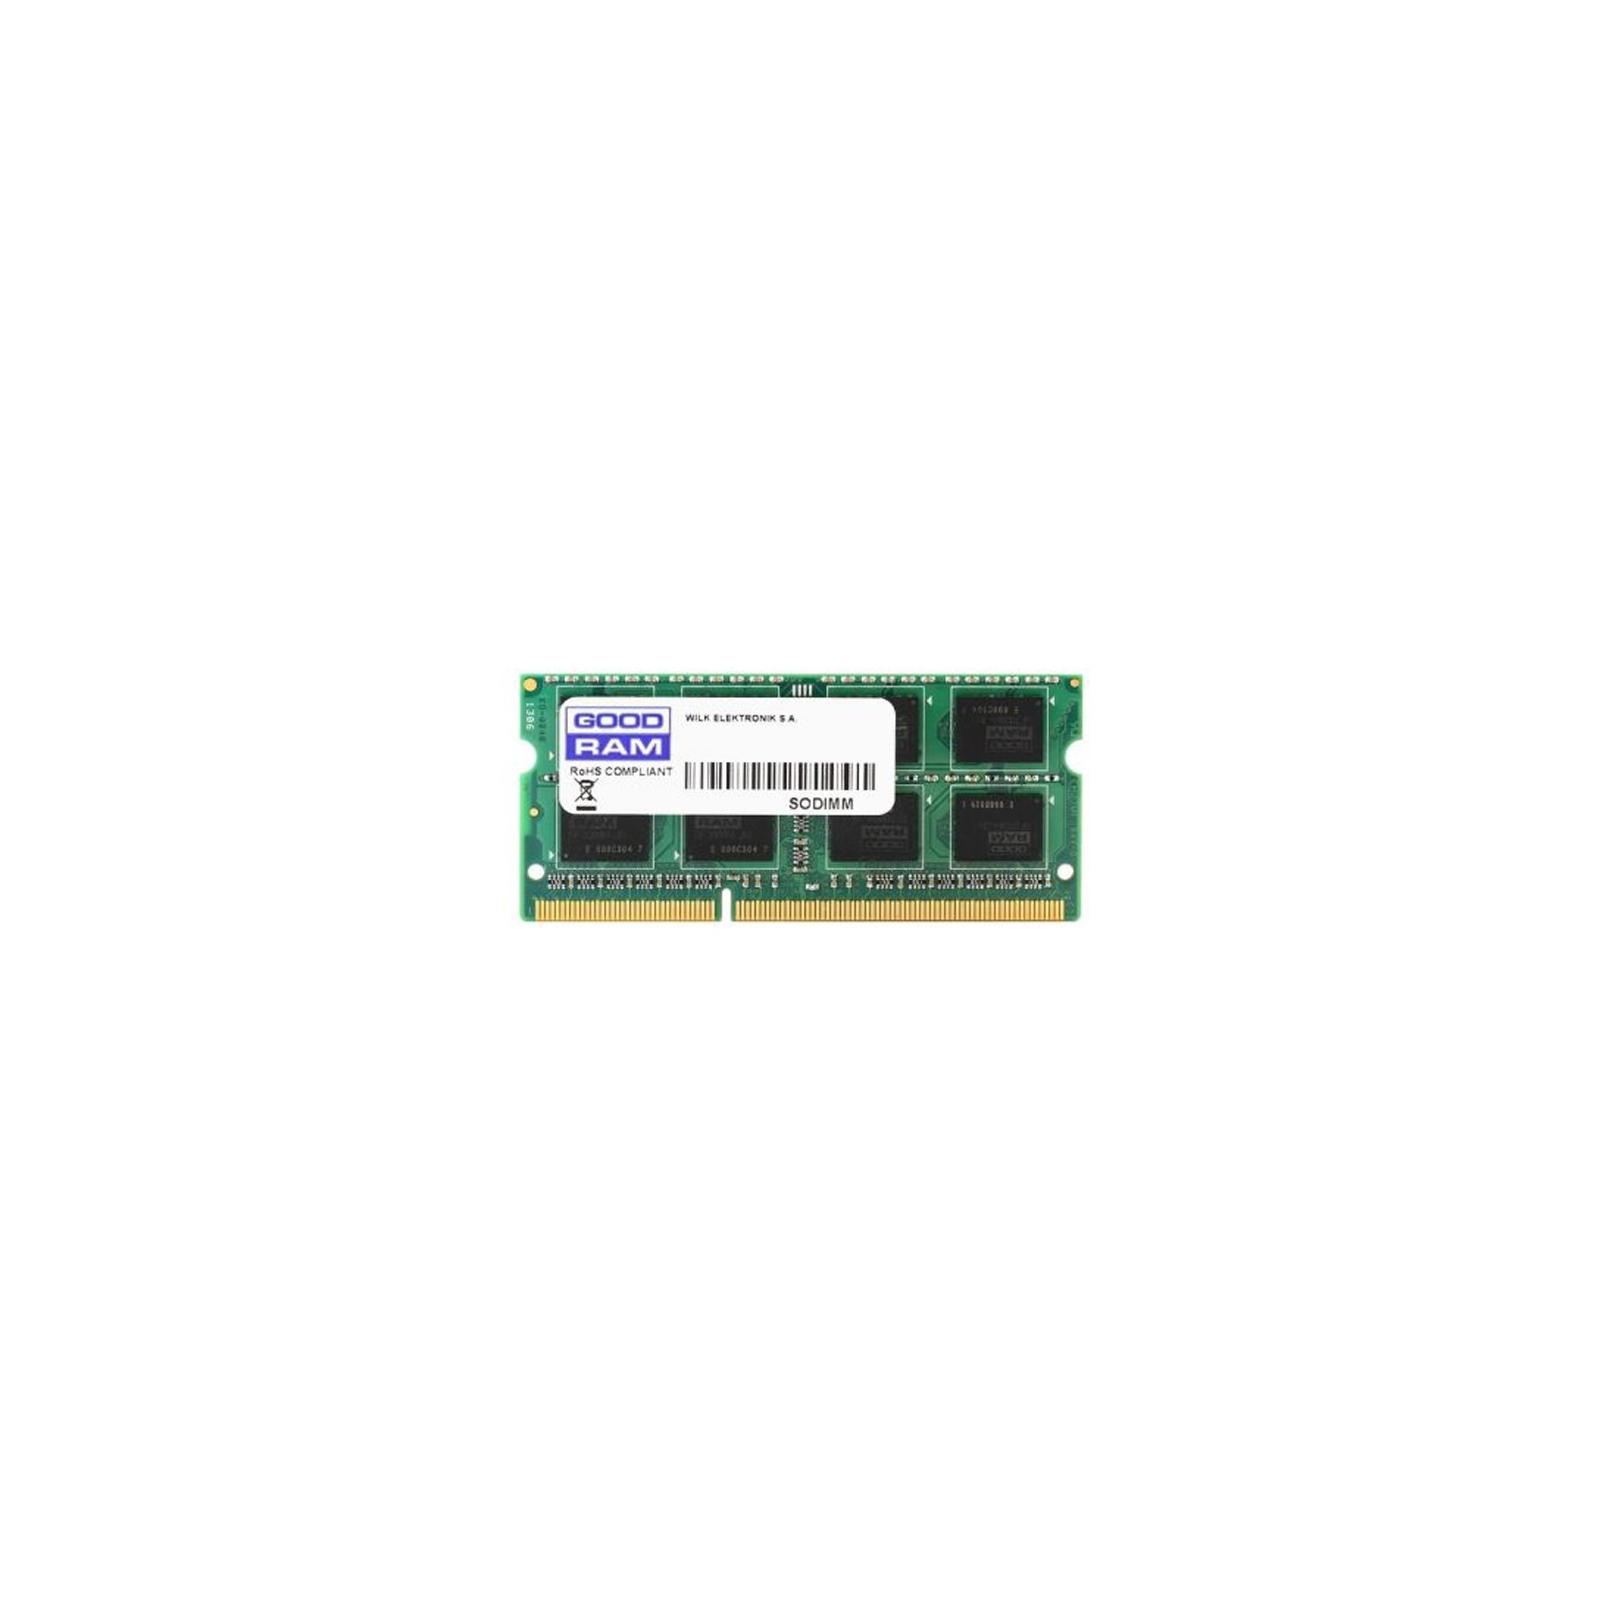 Модуль памяти для ноутбука SoDIMM DDR3 2GB 1600 MHz GOODRAM (GR1600S364L11N/2G)